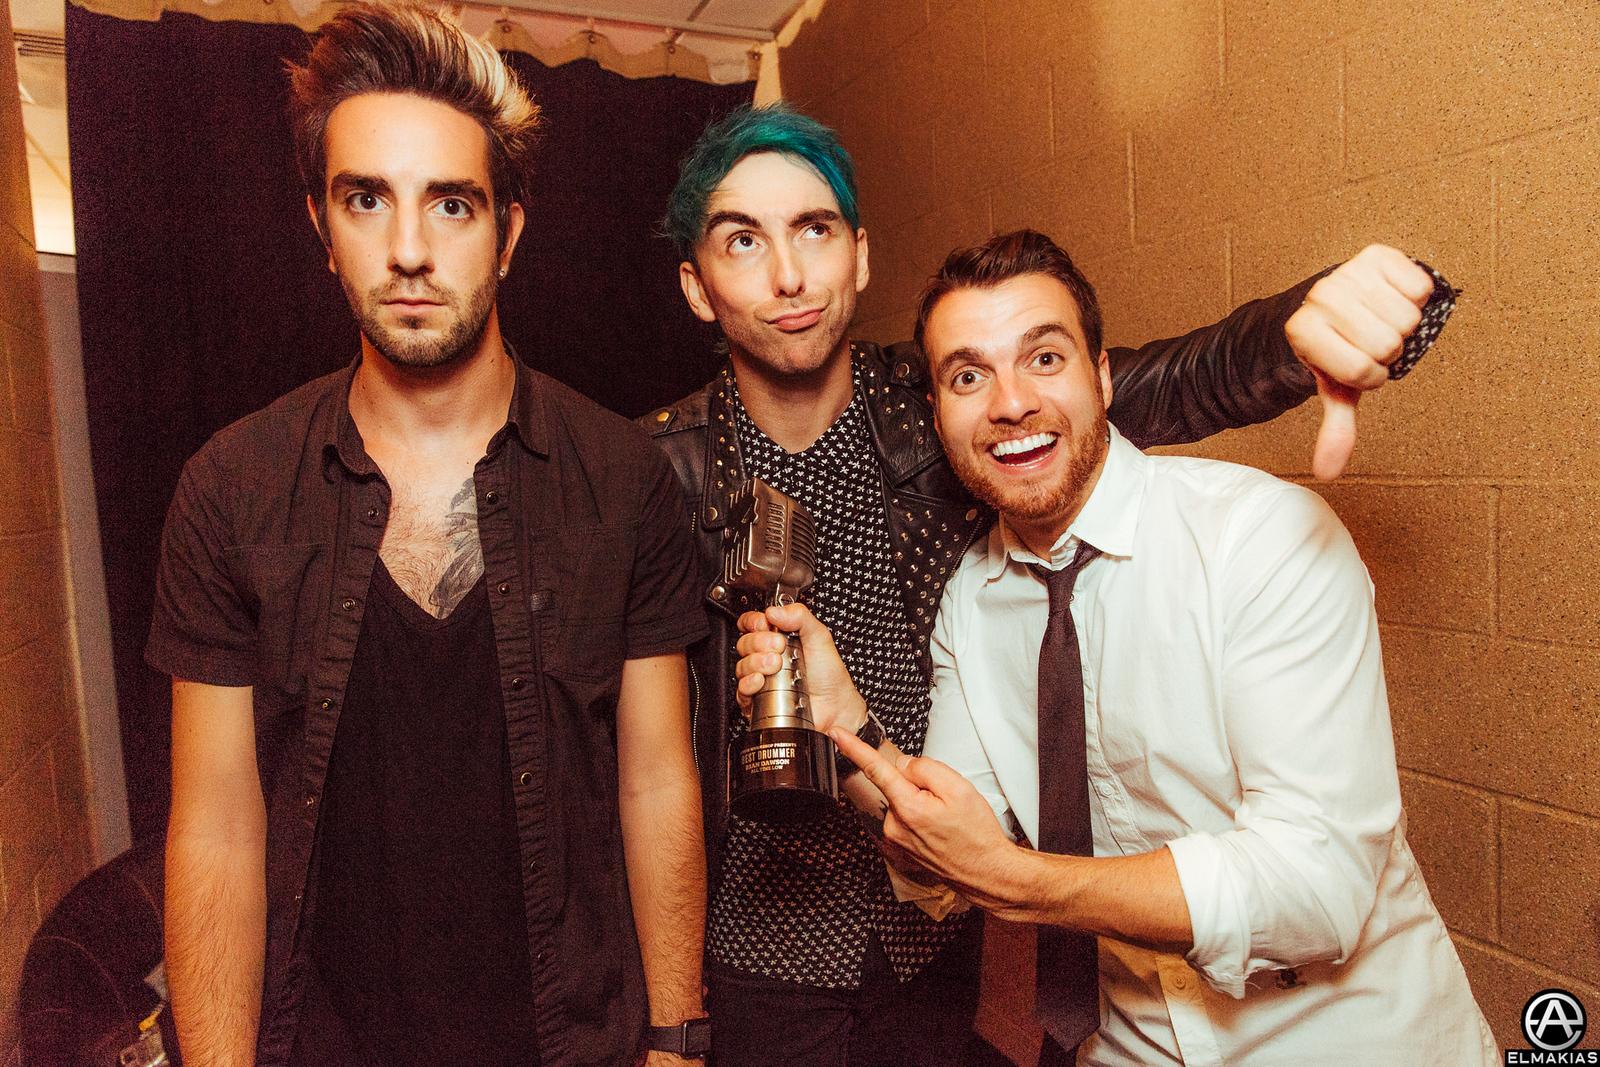 Alex Gaskarth, Jack Barakat, and Rian Dawson of All Time Low at the Alternative Press Music Awards 2015 by Adam Elmakias